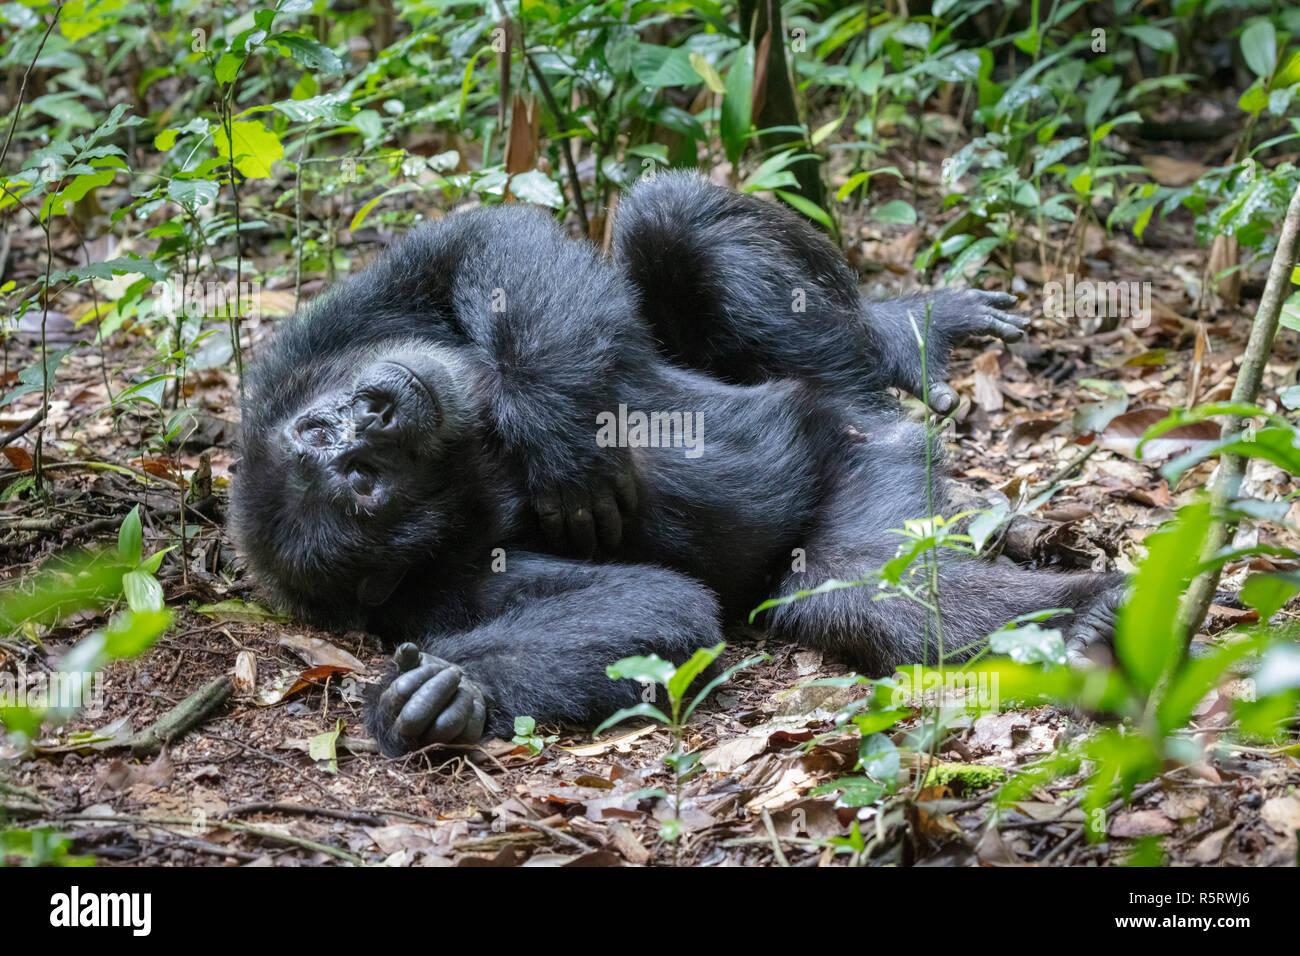 Chimpanzees at Kibale National Forest, Uganda - Stock Image